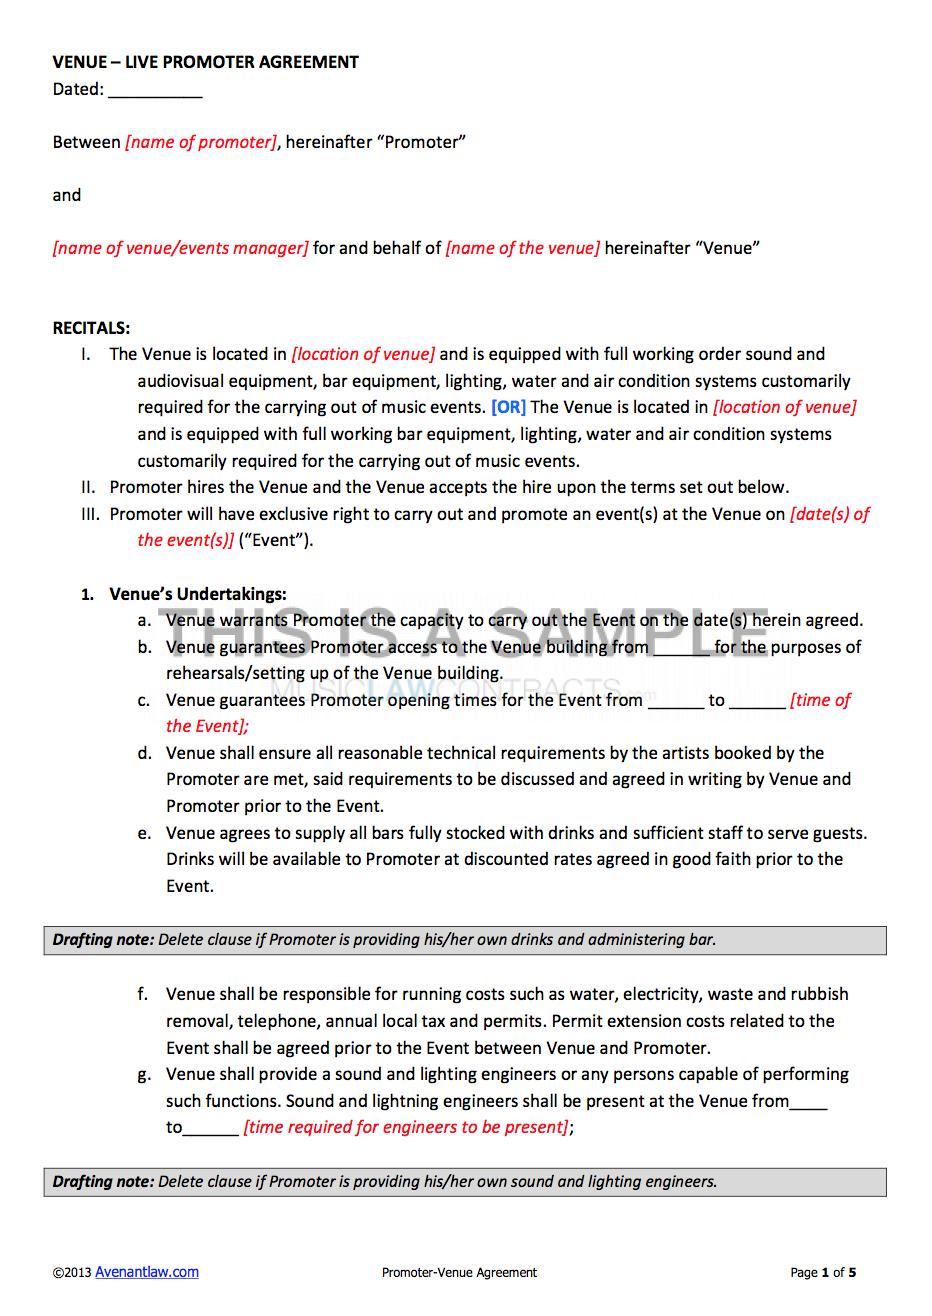 Promoter Venue Contract Template